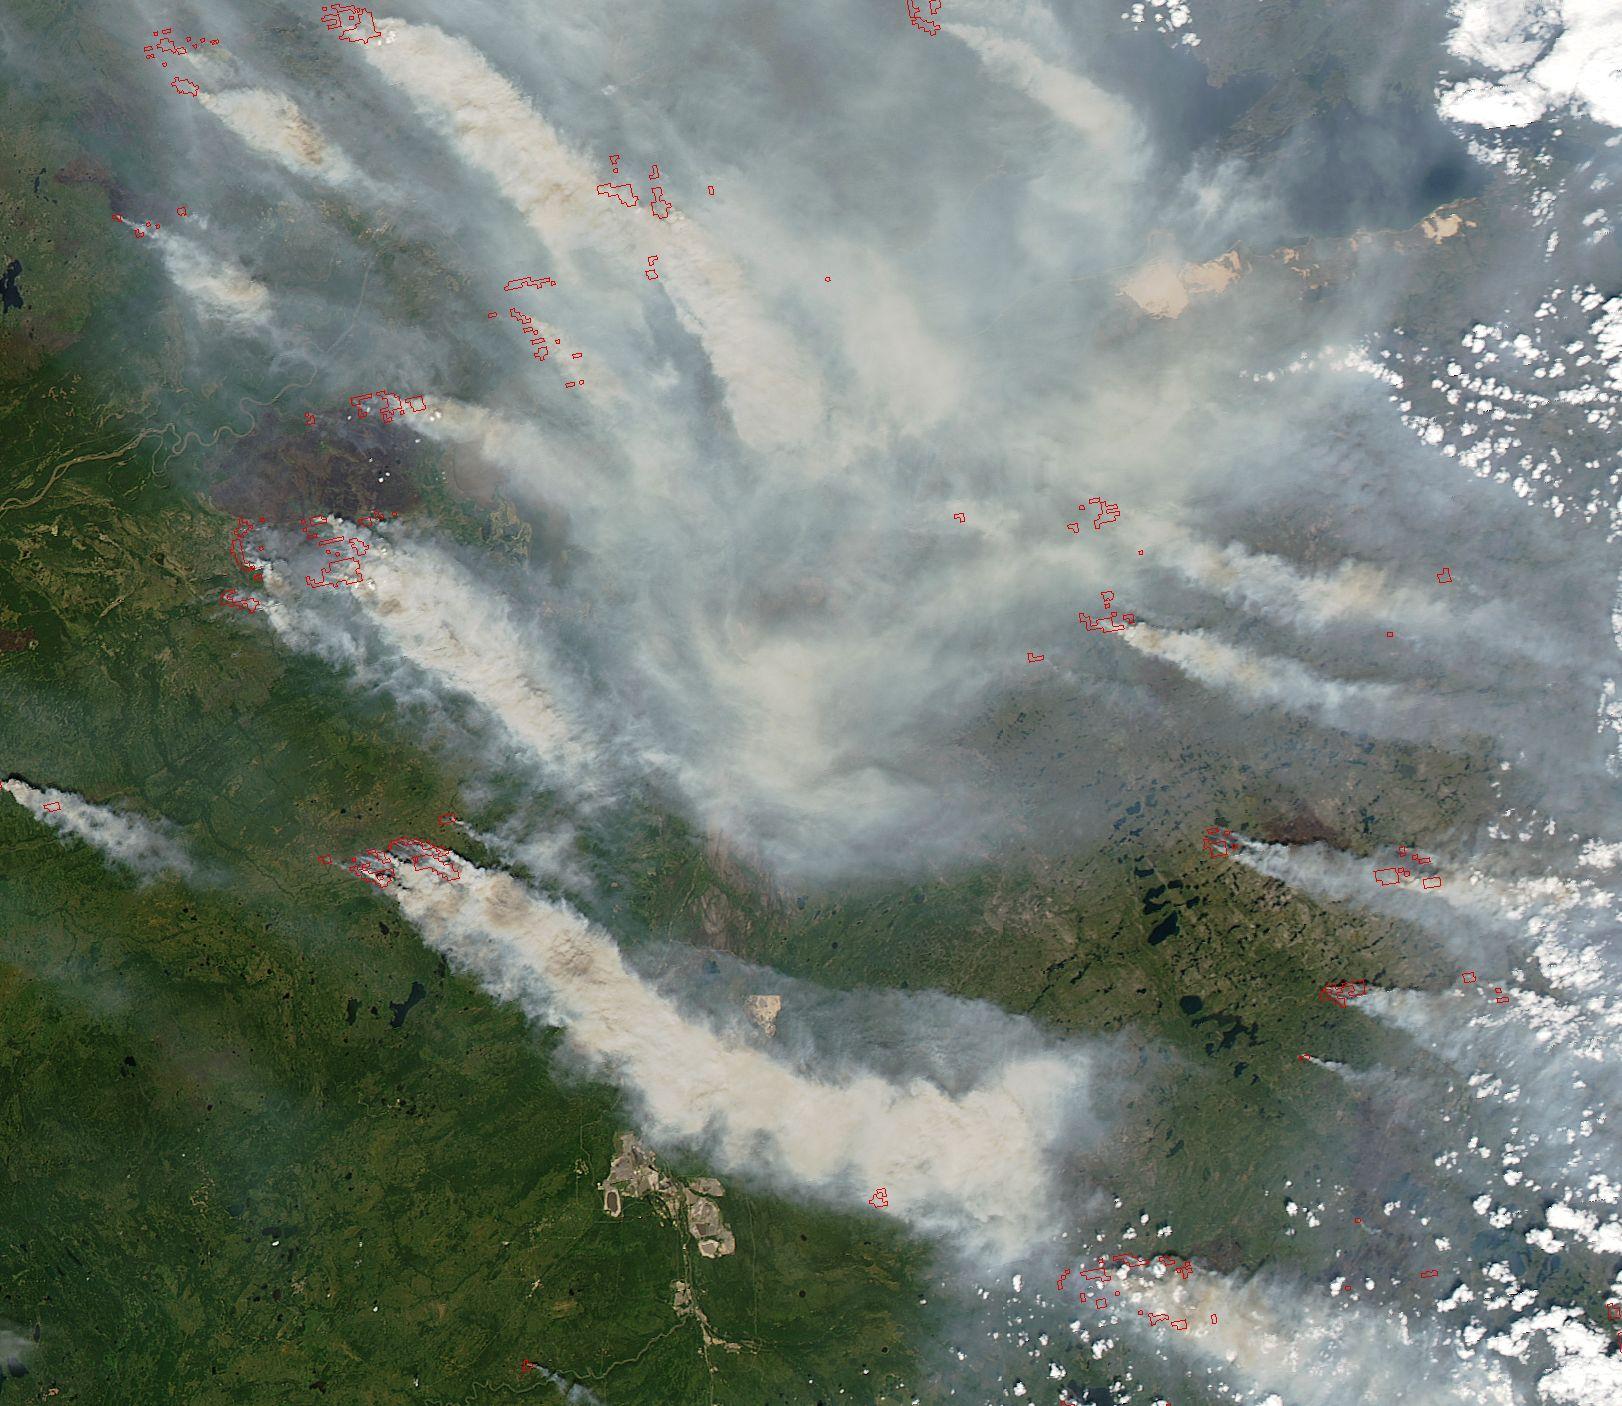 Terra - MODIS - Incendie - Wild Fires - Canada - Alberta - Saskatchewan - Juin 2015 - vus par satellite - NASA - GSFC - ESDIS - LANCE